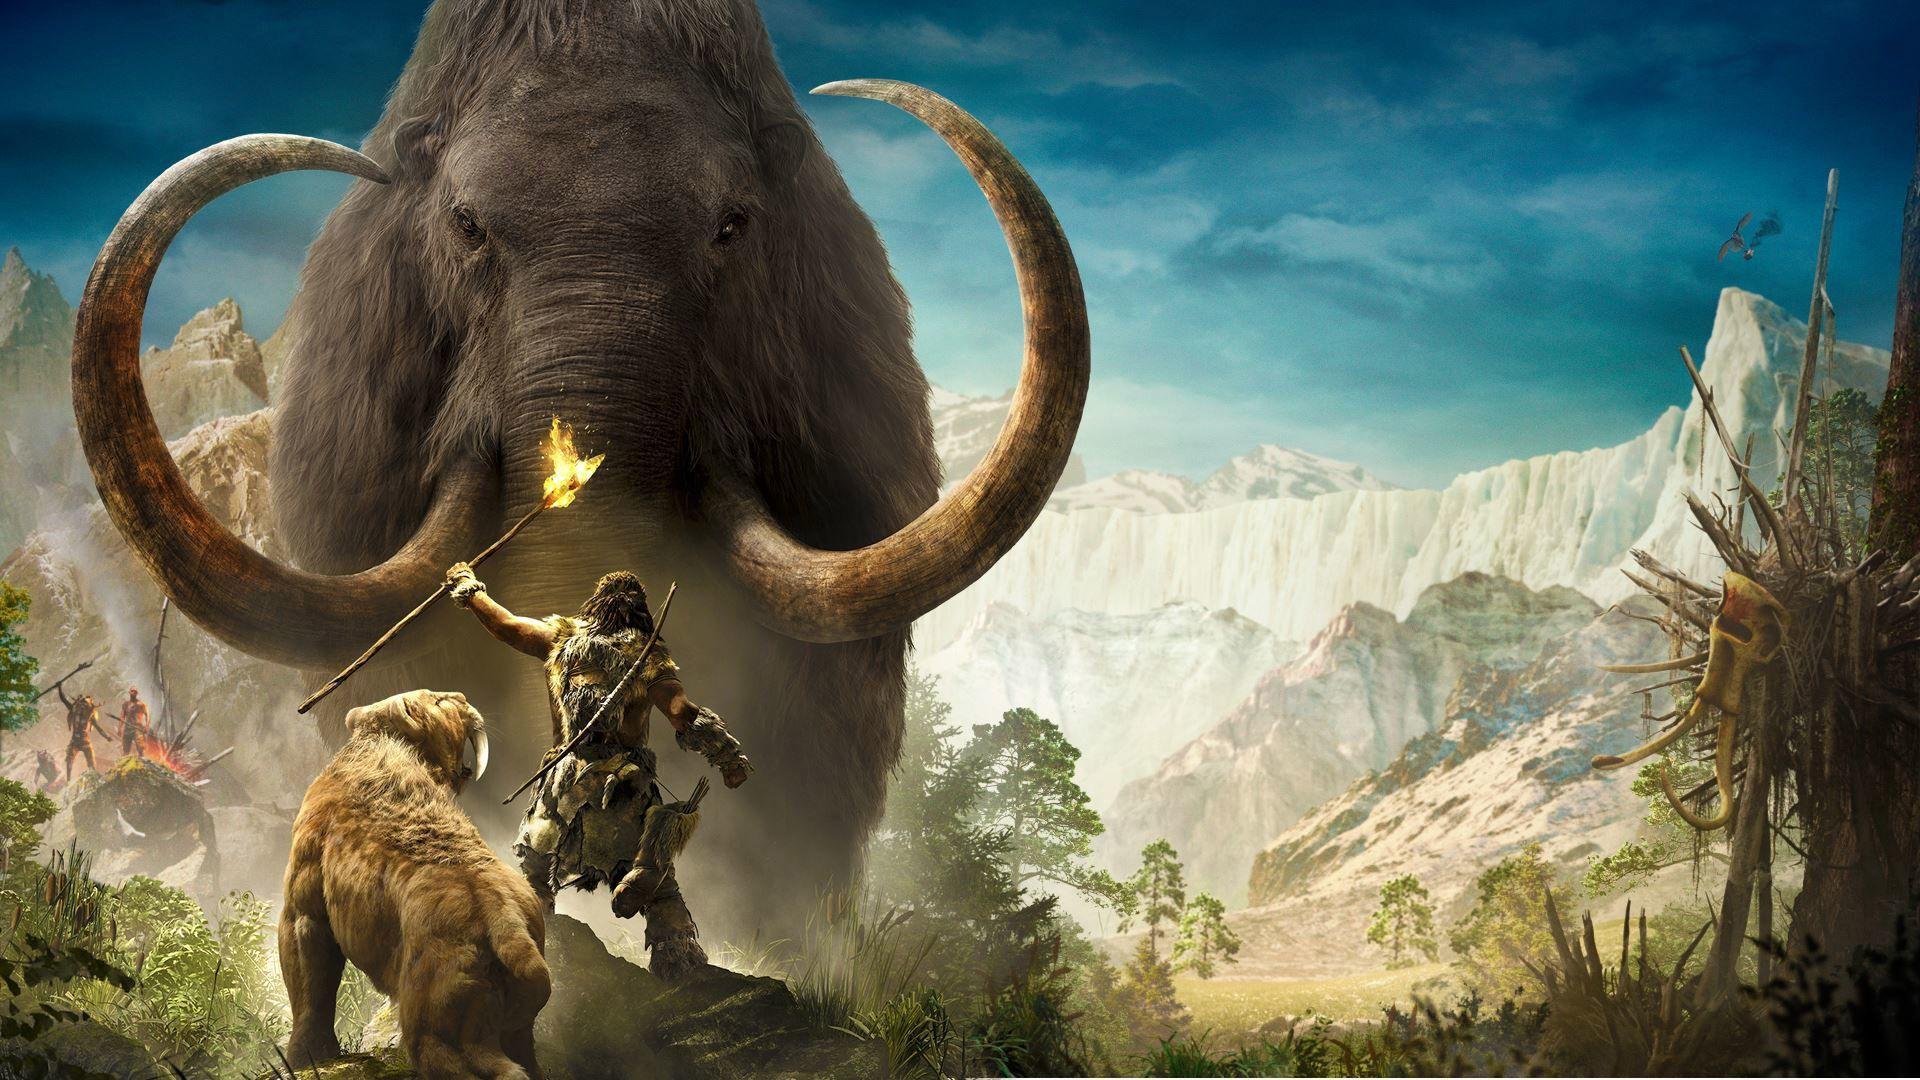 Far Cry Primal Mammoth | Far Cry Primal Wallpaper in